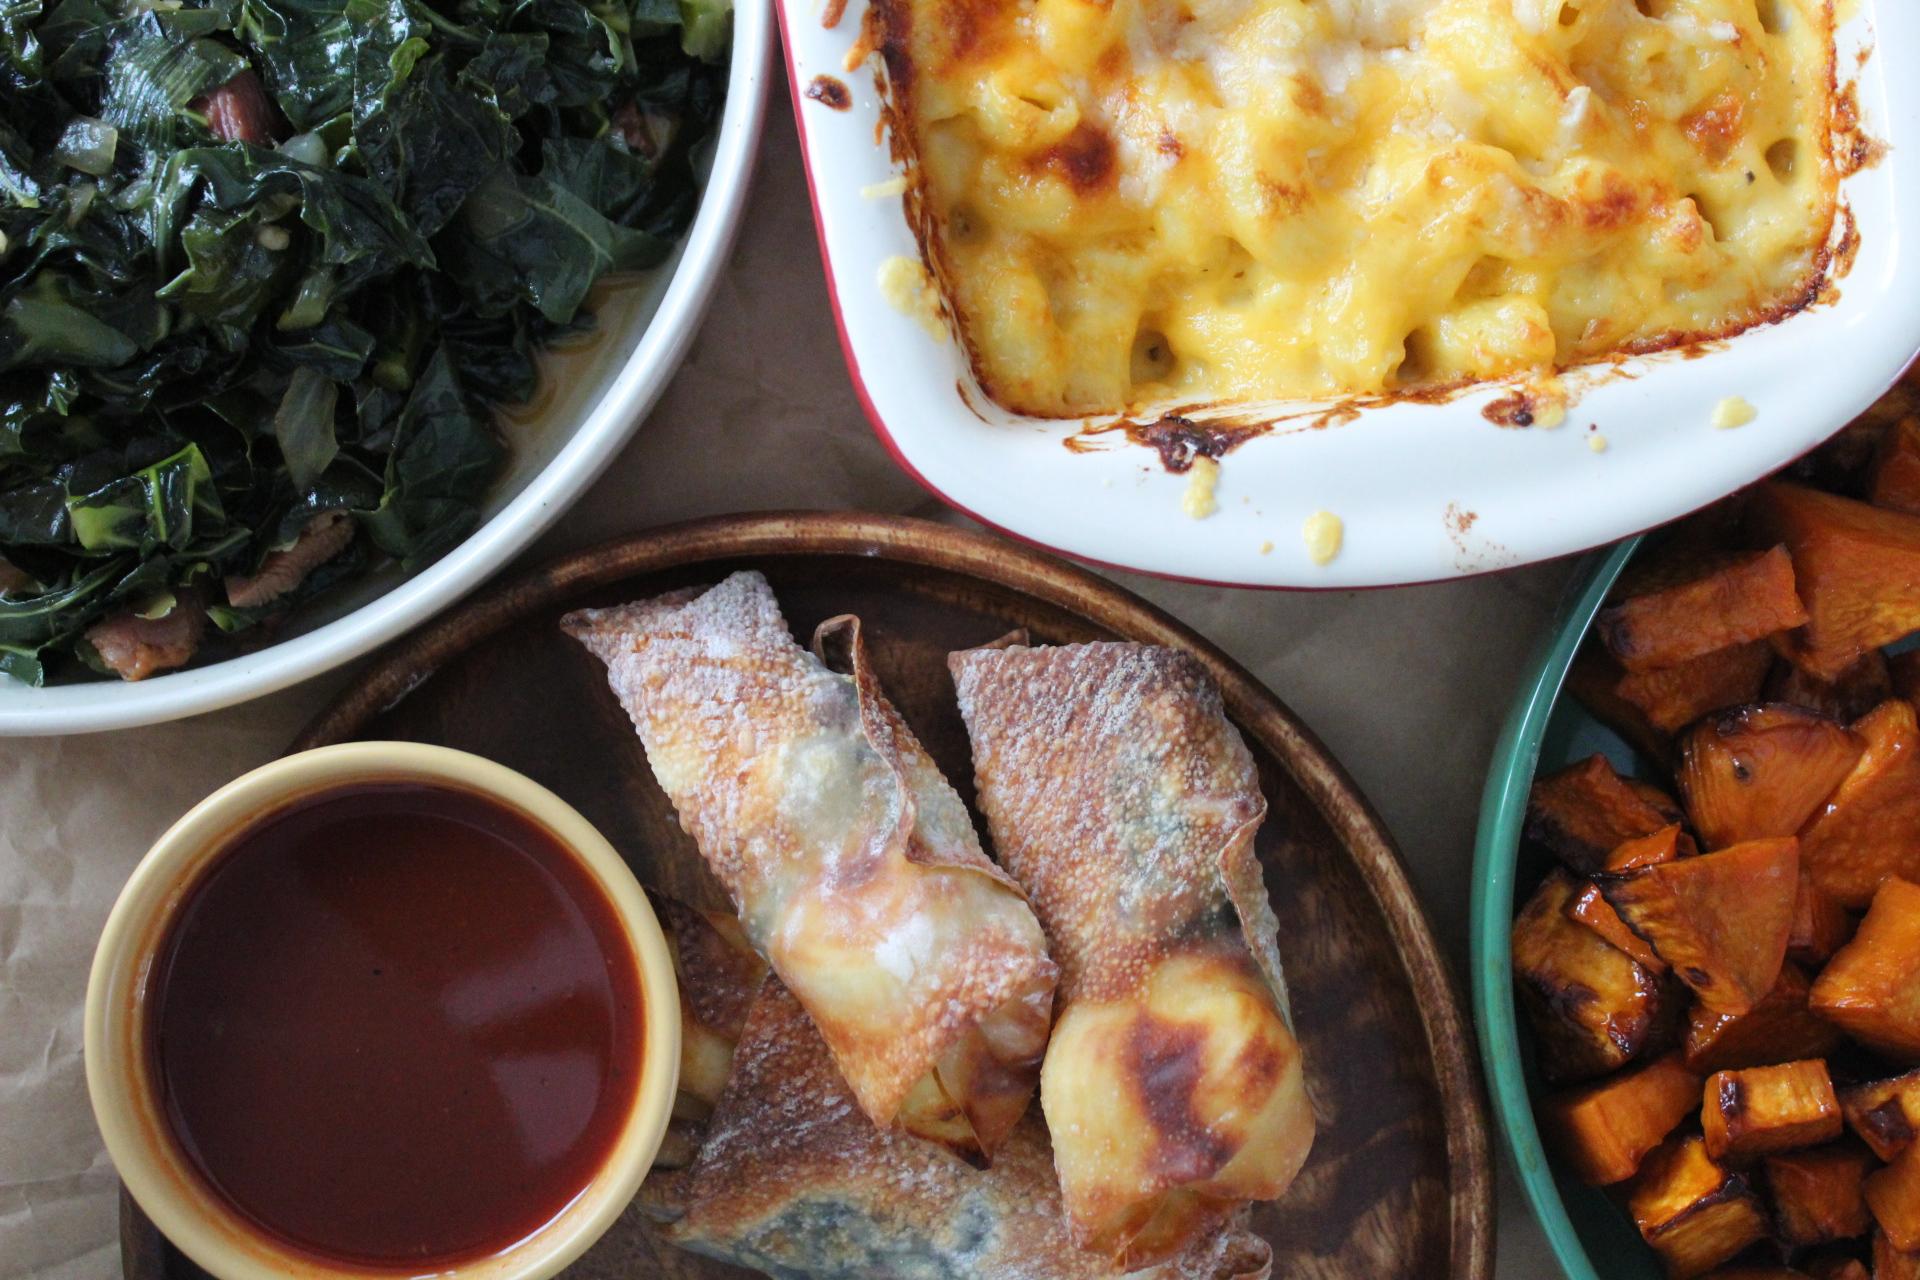 Soul Rolls, dipping sauce, mac & cheese, collard greens and sweet potatoes